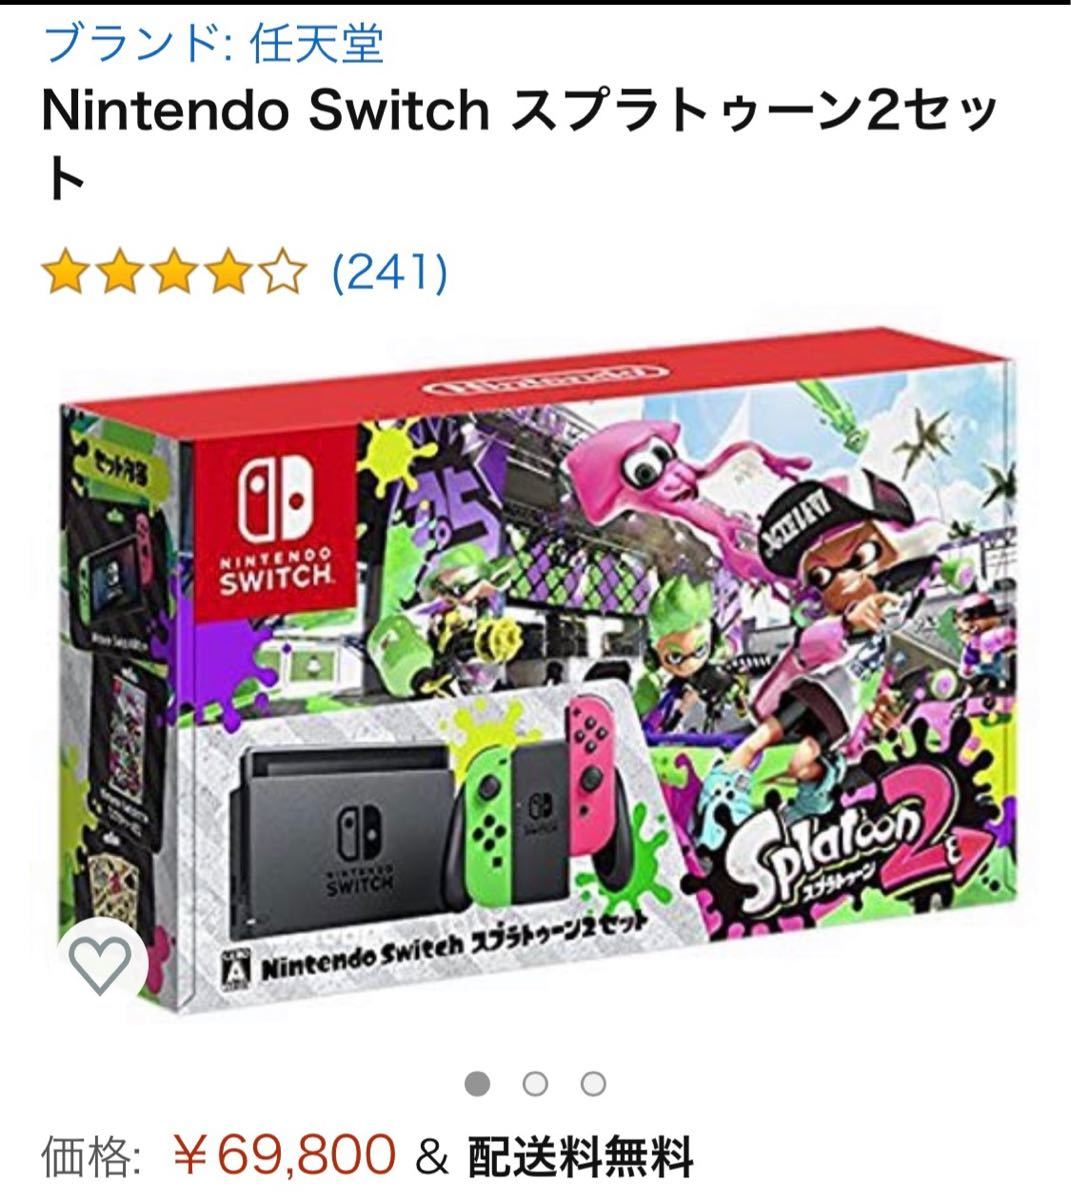 Nintendo Switch スプラトゥーン2セット コントローラー付き